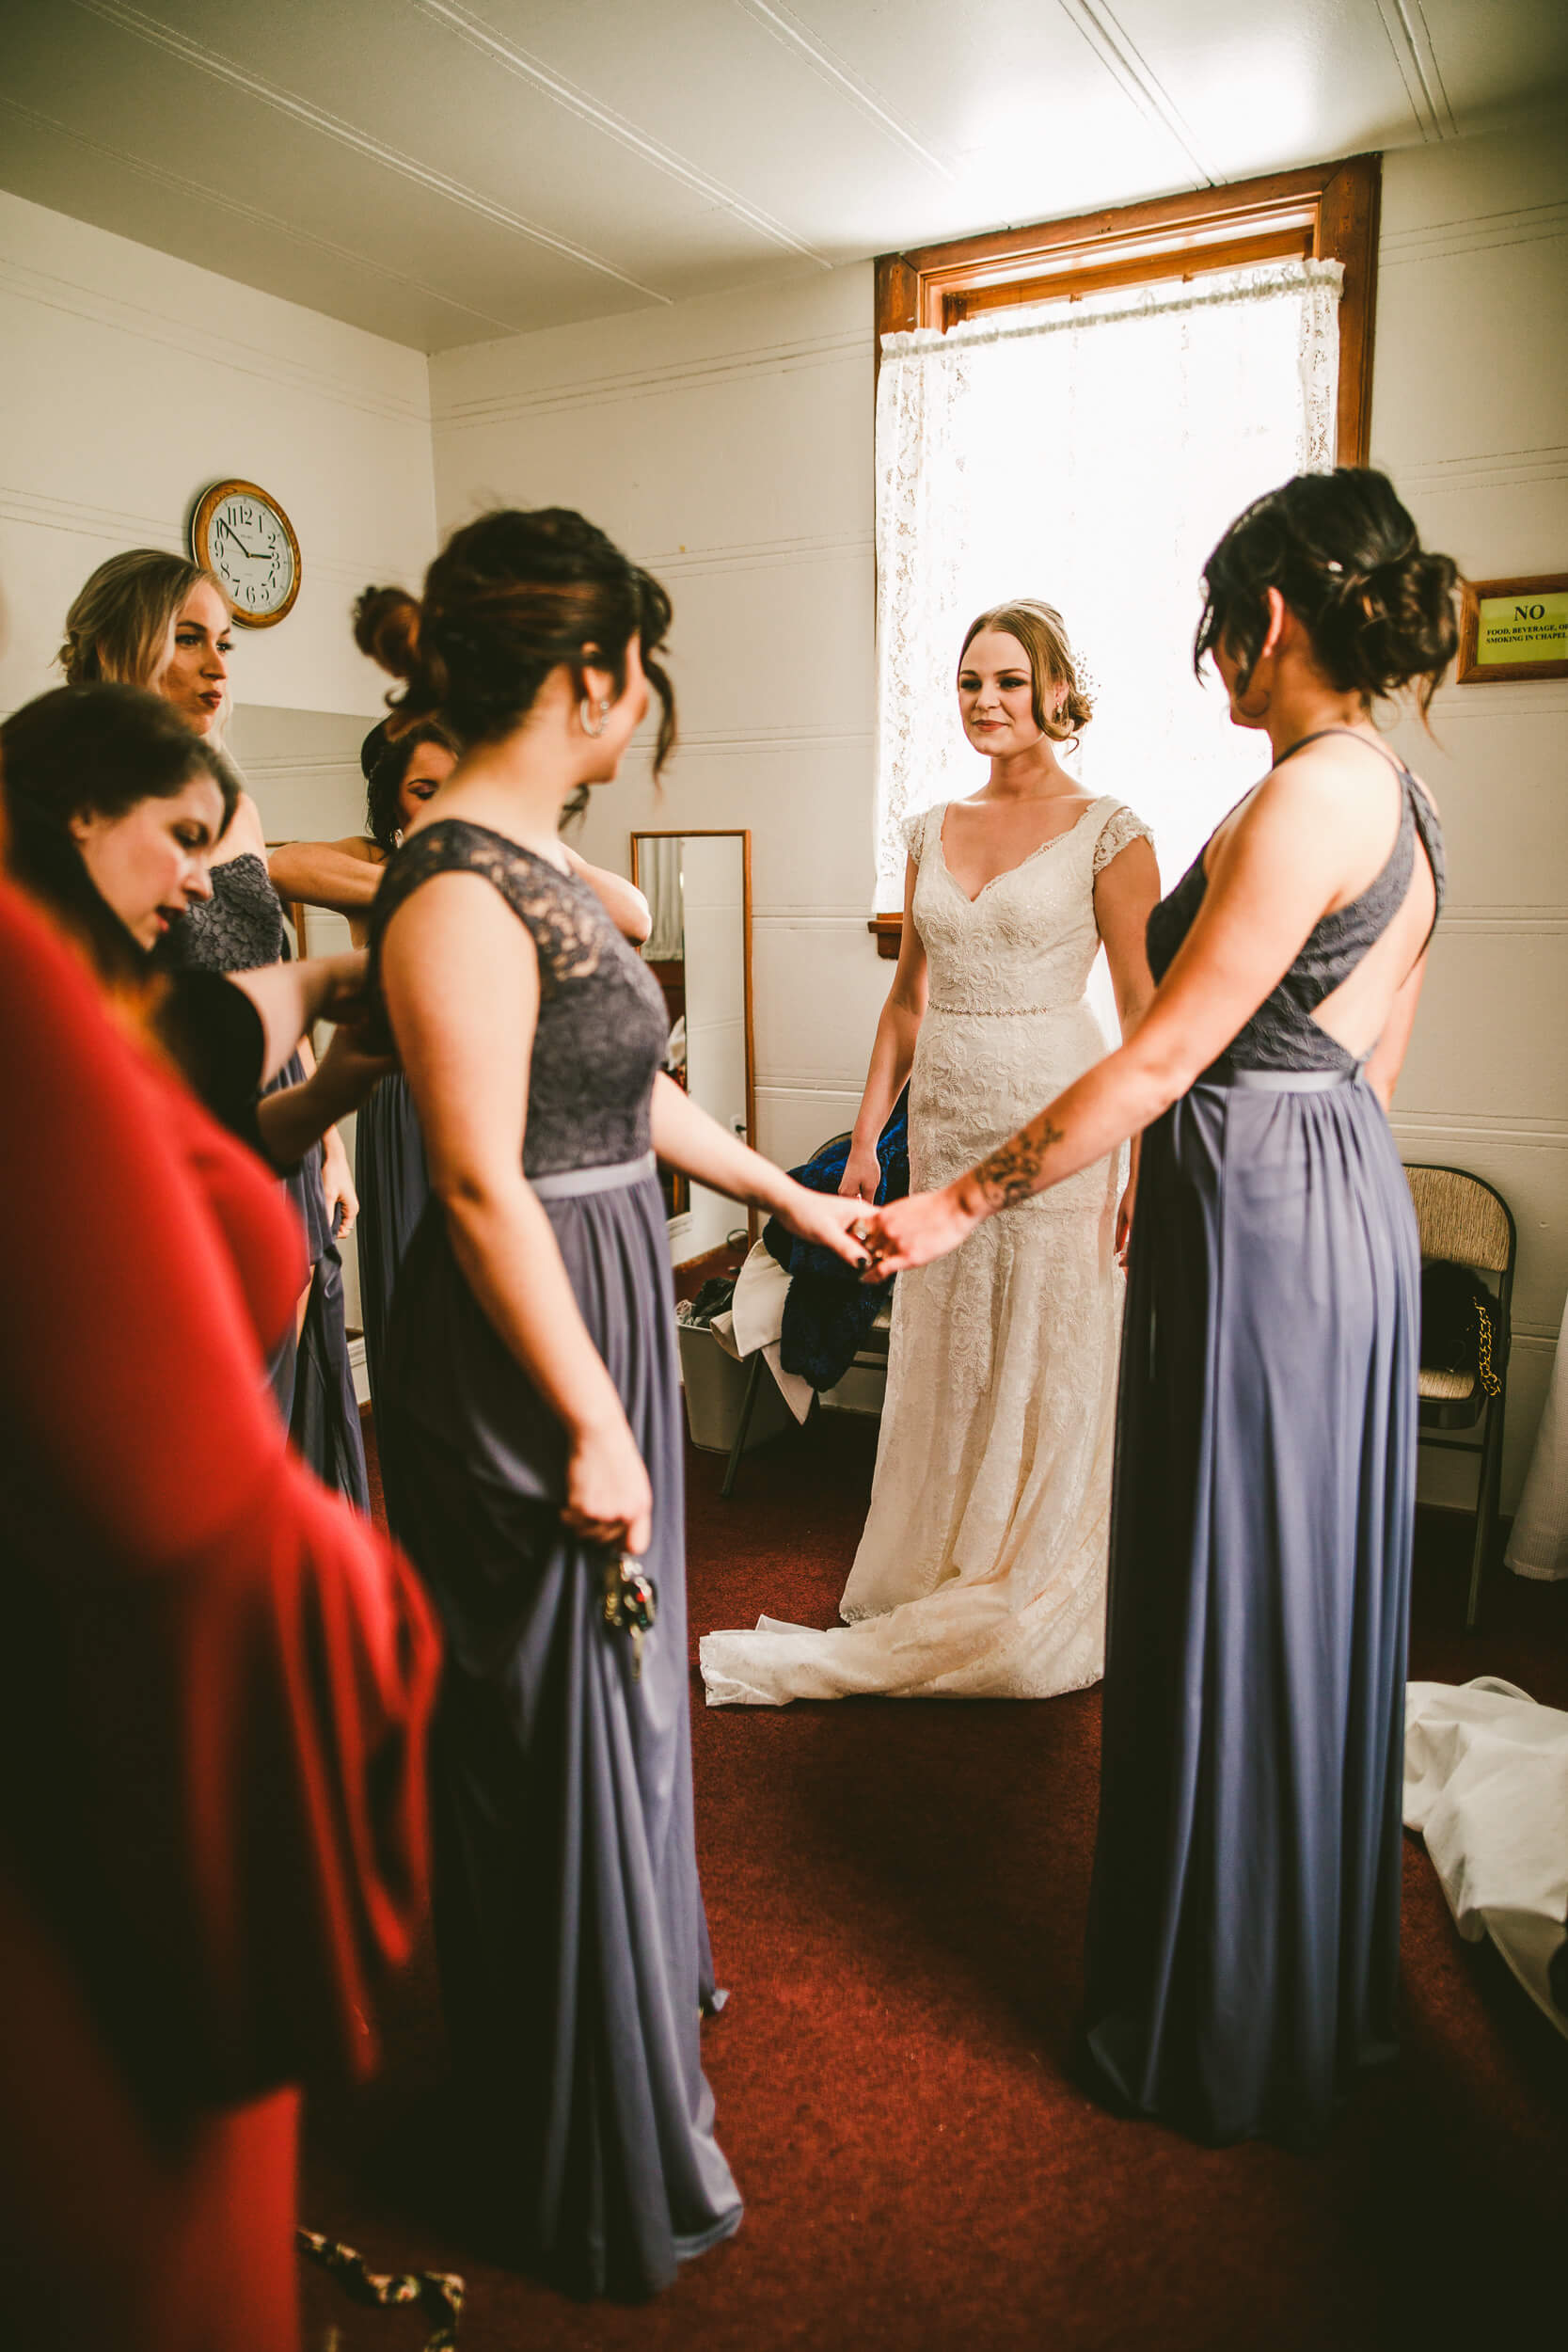 mukogawa winter wedding in spokane (37).jpg